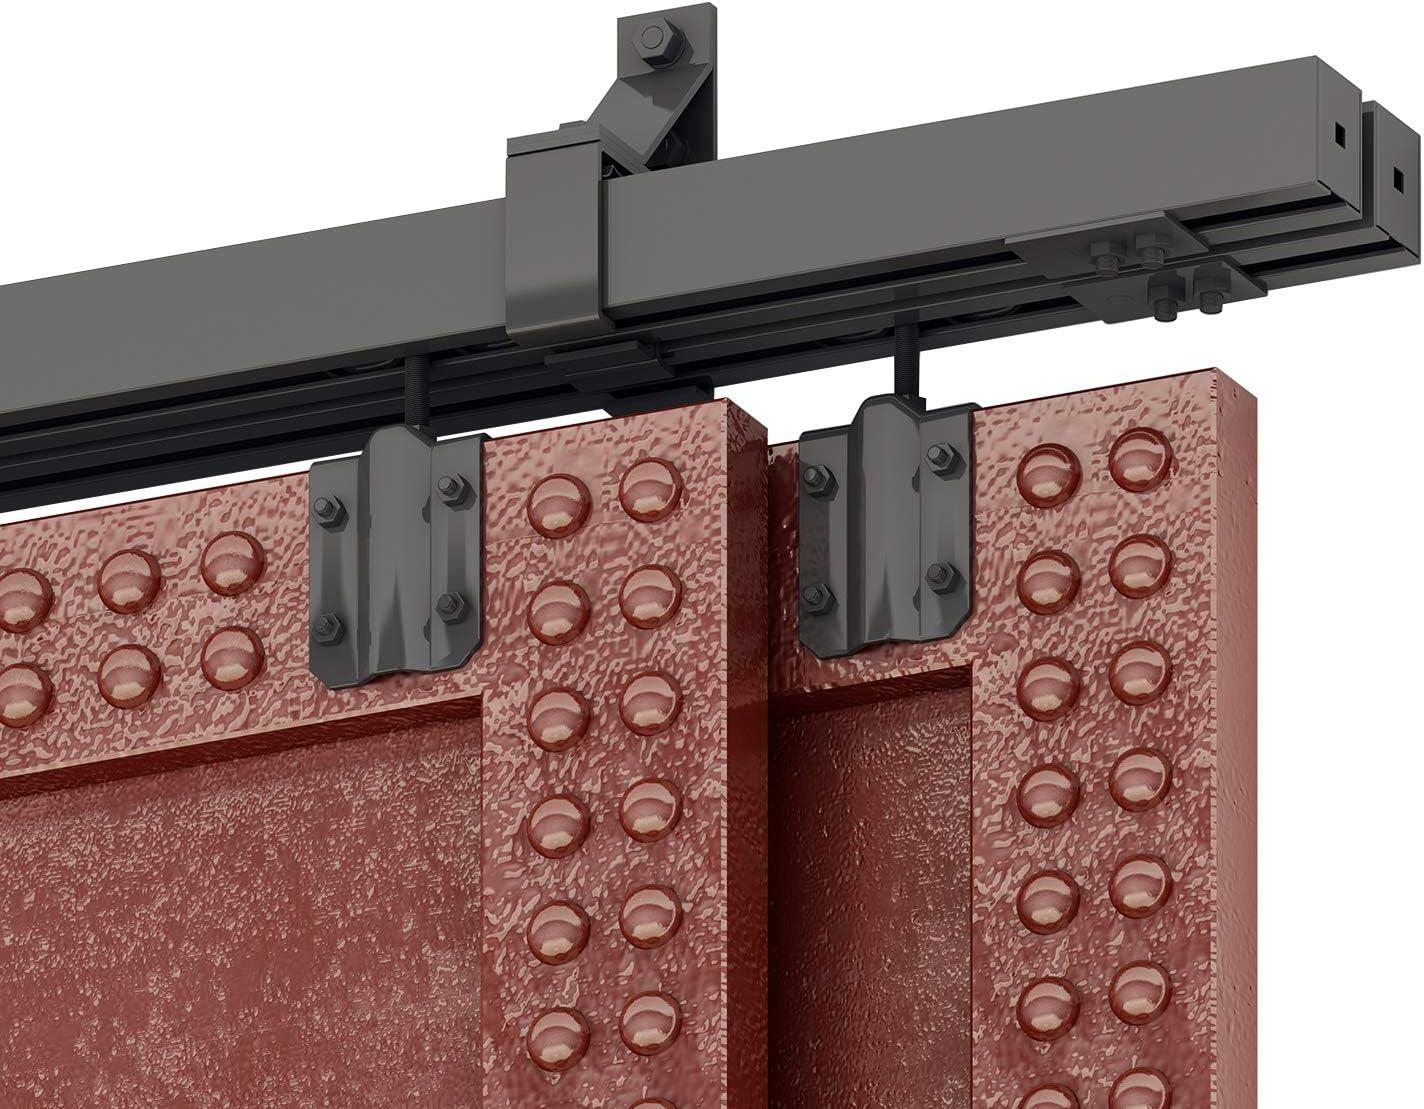 Amazon Com Diyhd 6ft Box Rail Heavy Duty Bypass Barn Door Hardware Black Box Track Exterior Sliding Barn Door Bypass Hardware Home Improvement